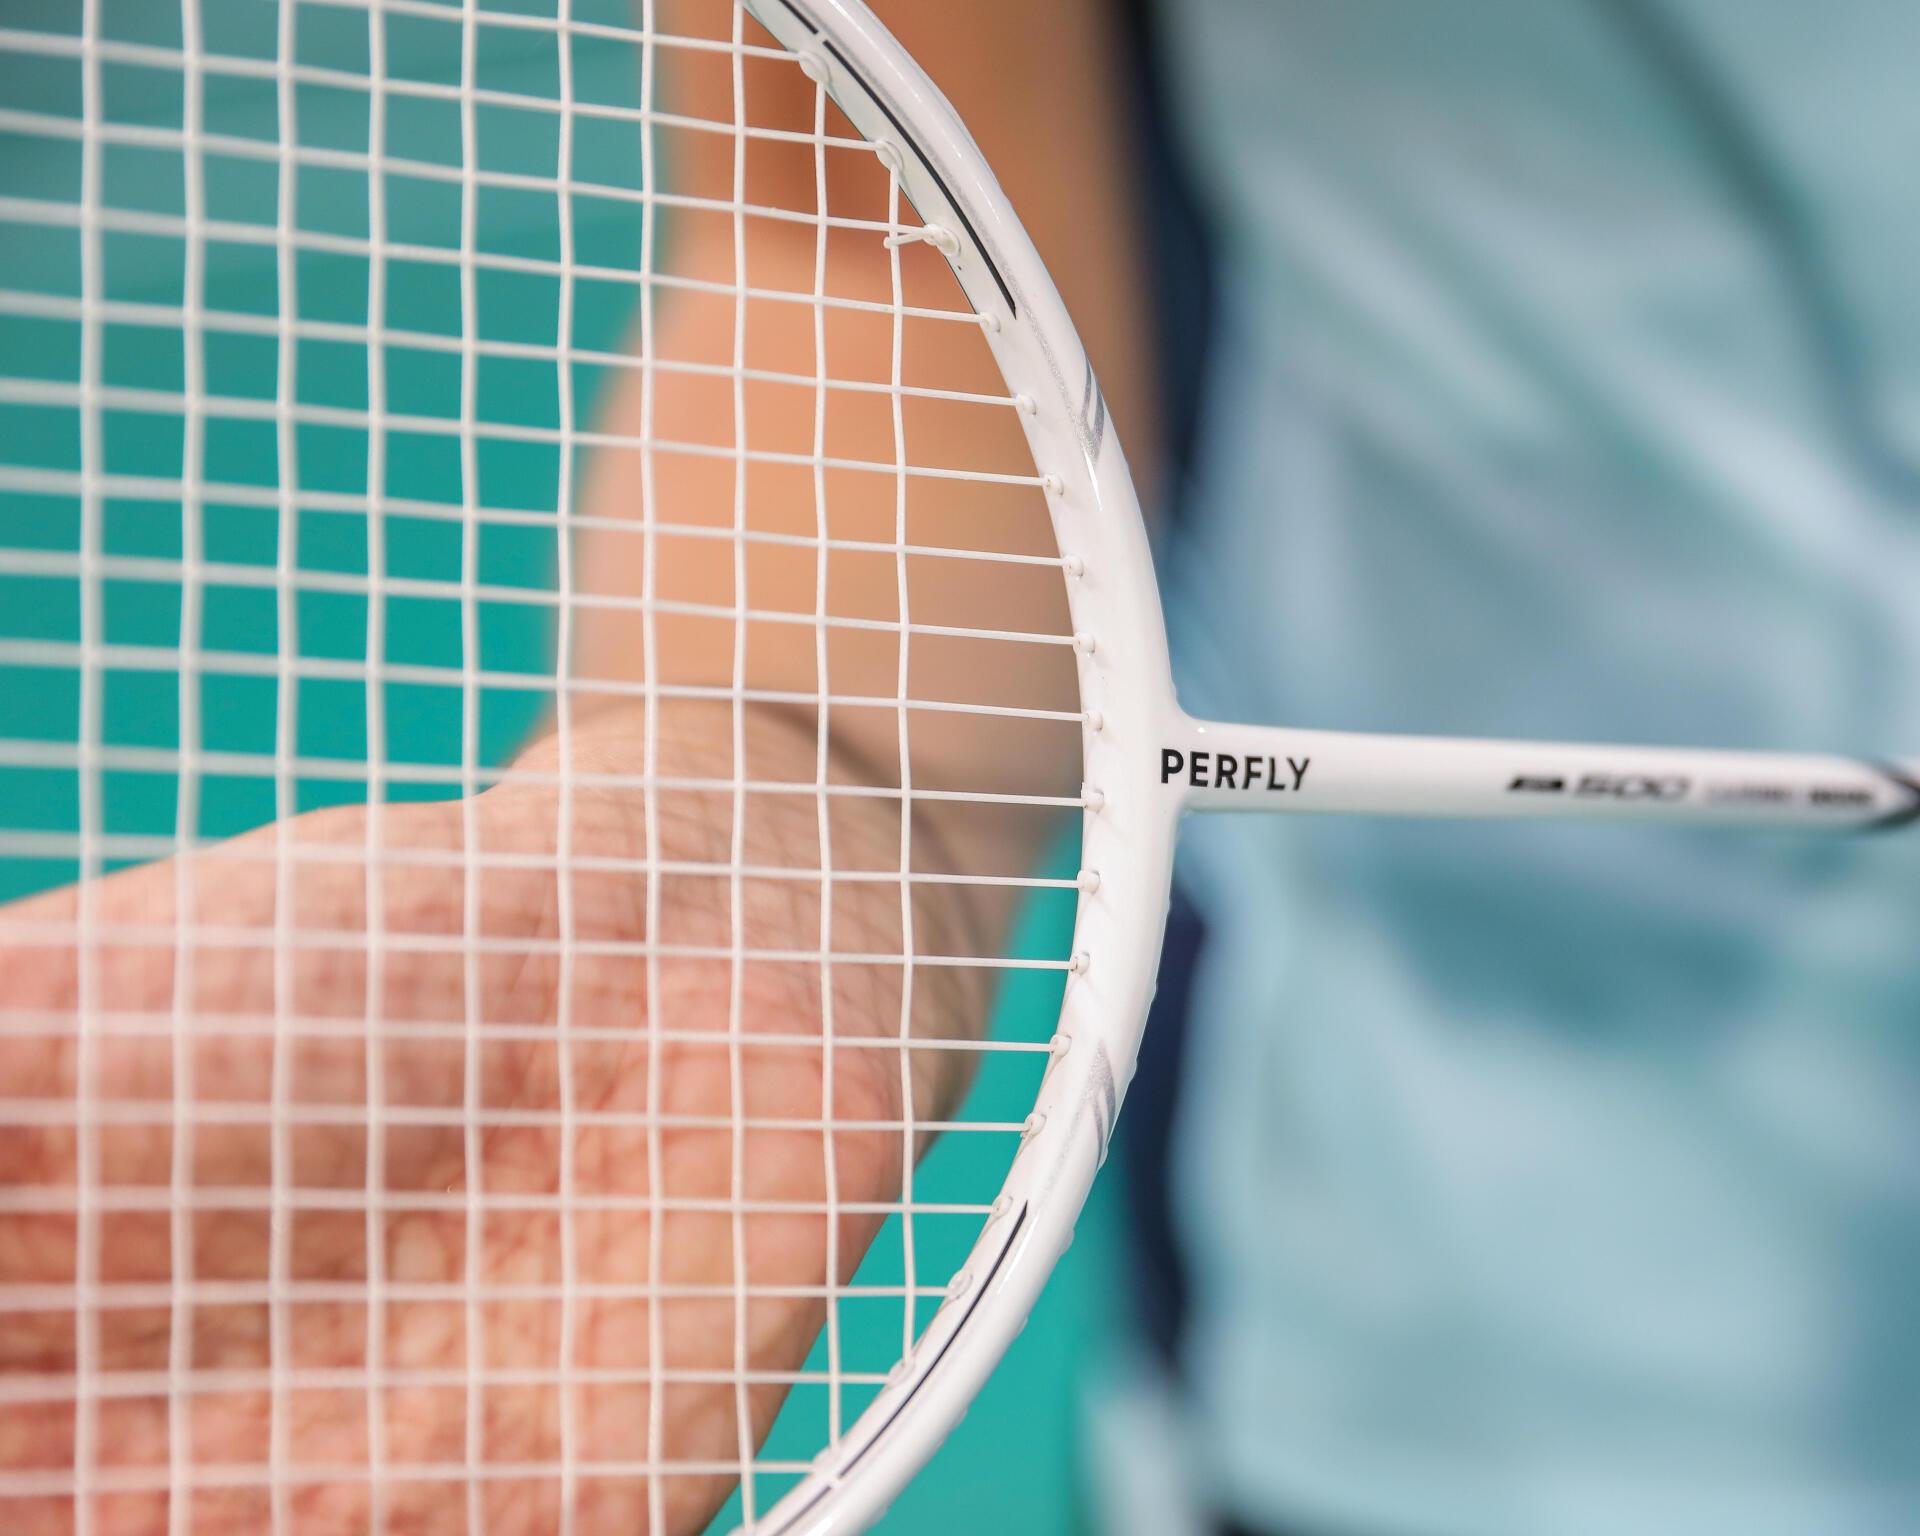 WEB dsk,mob,tab other it TW 2019 Badminton: John